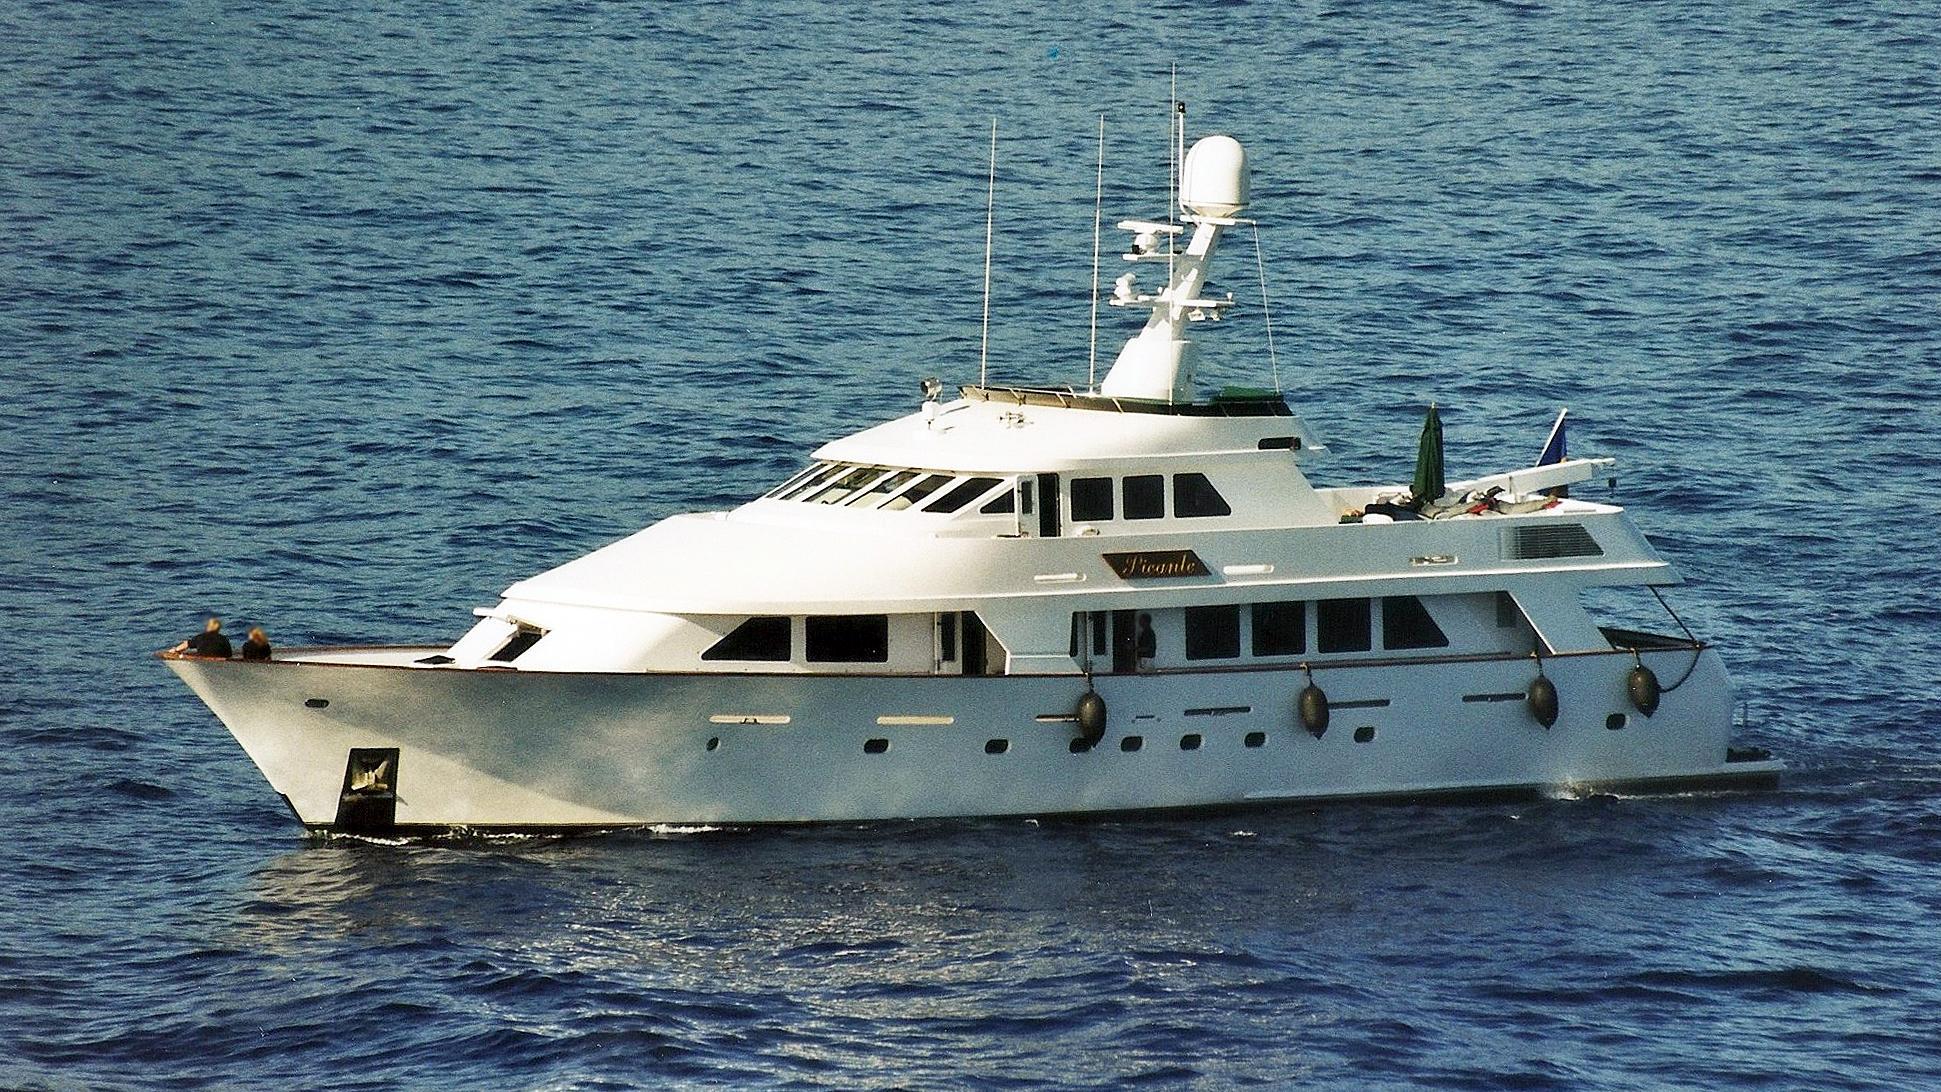 picante-motor-yacht-christensen-1989-37m-profile